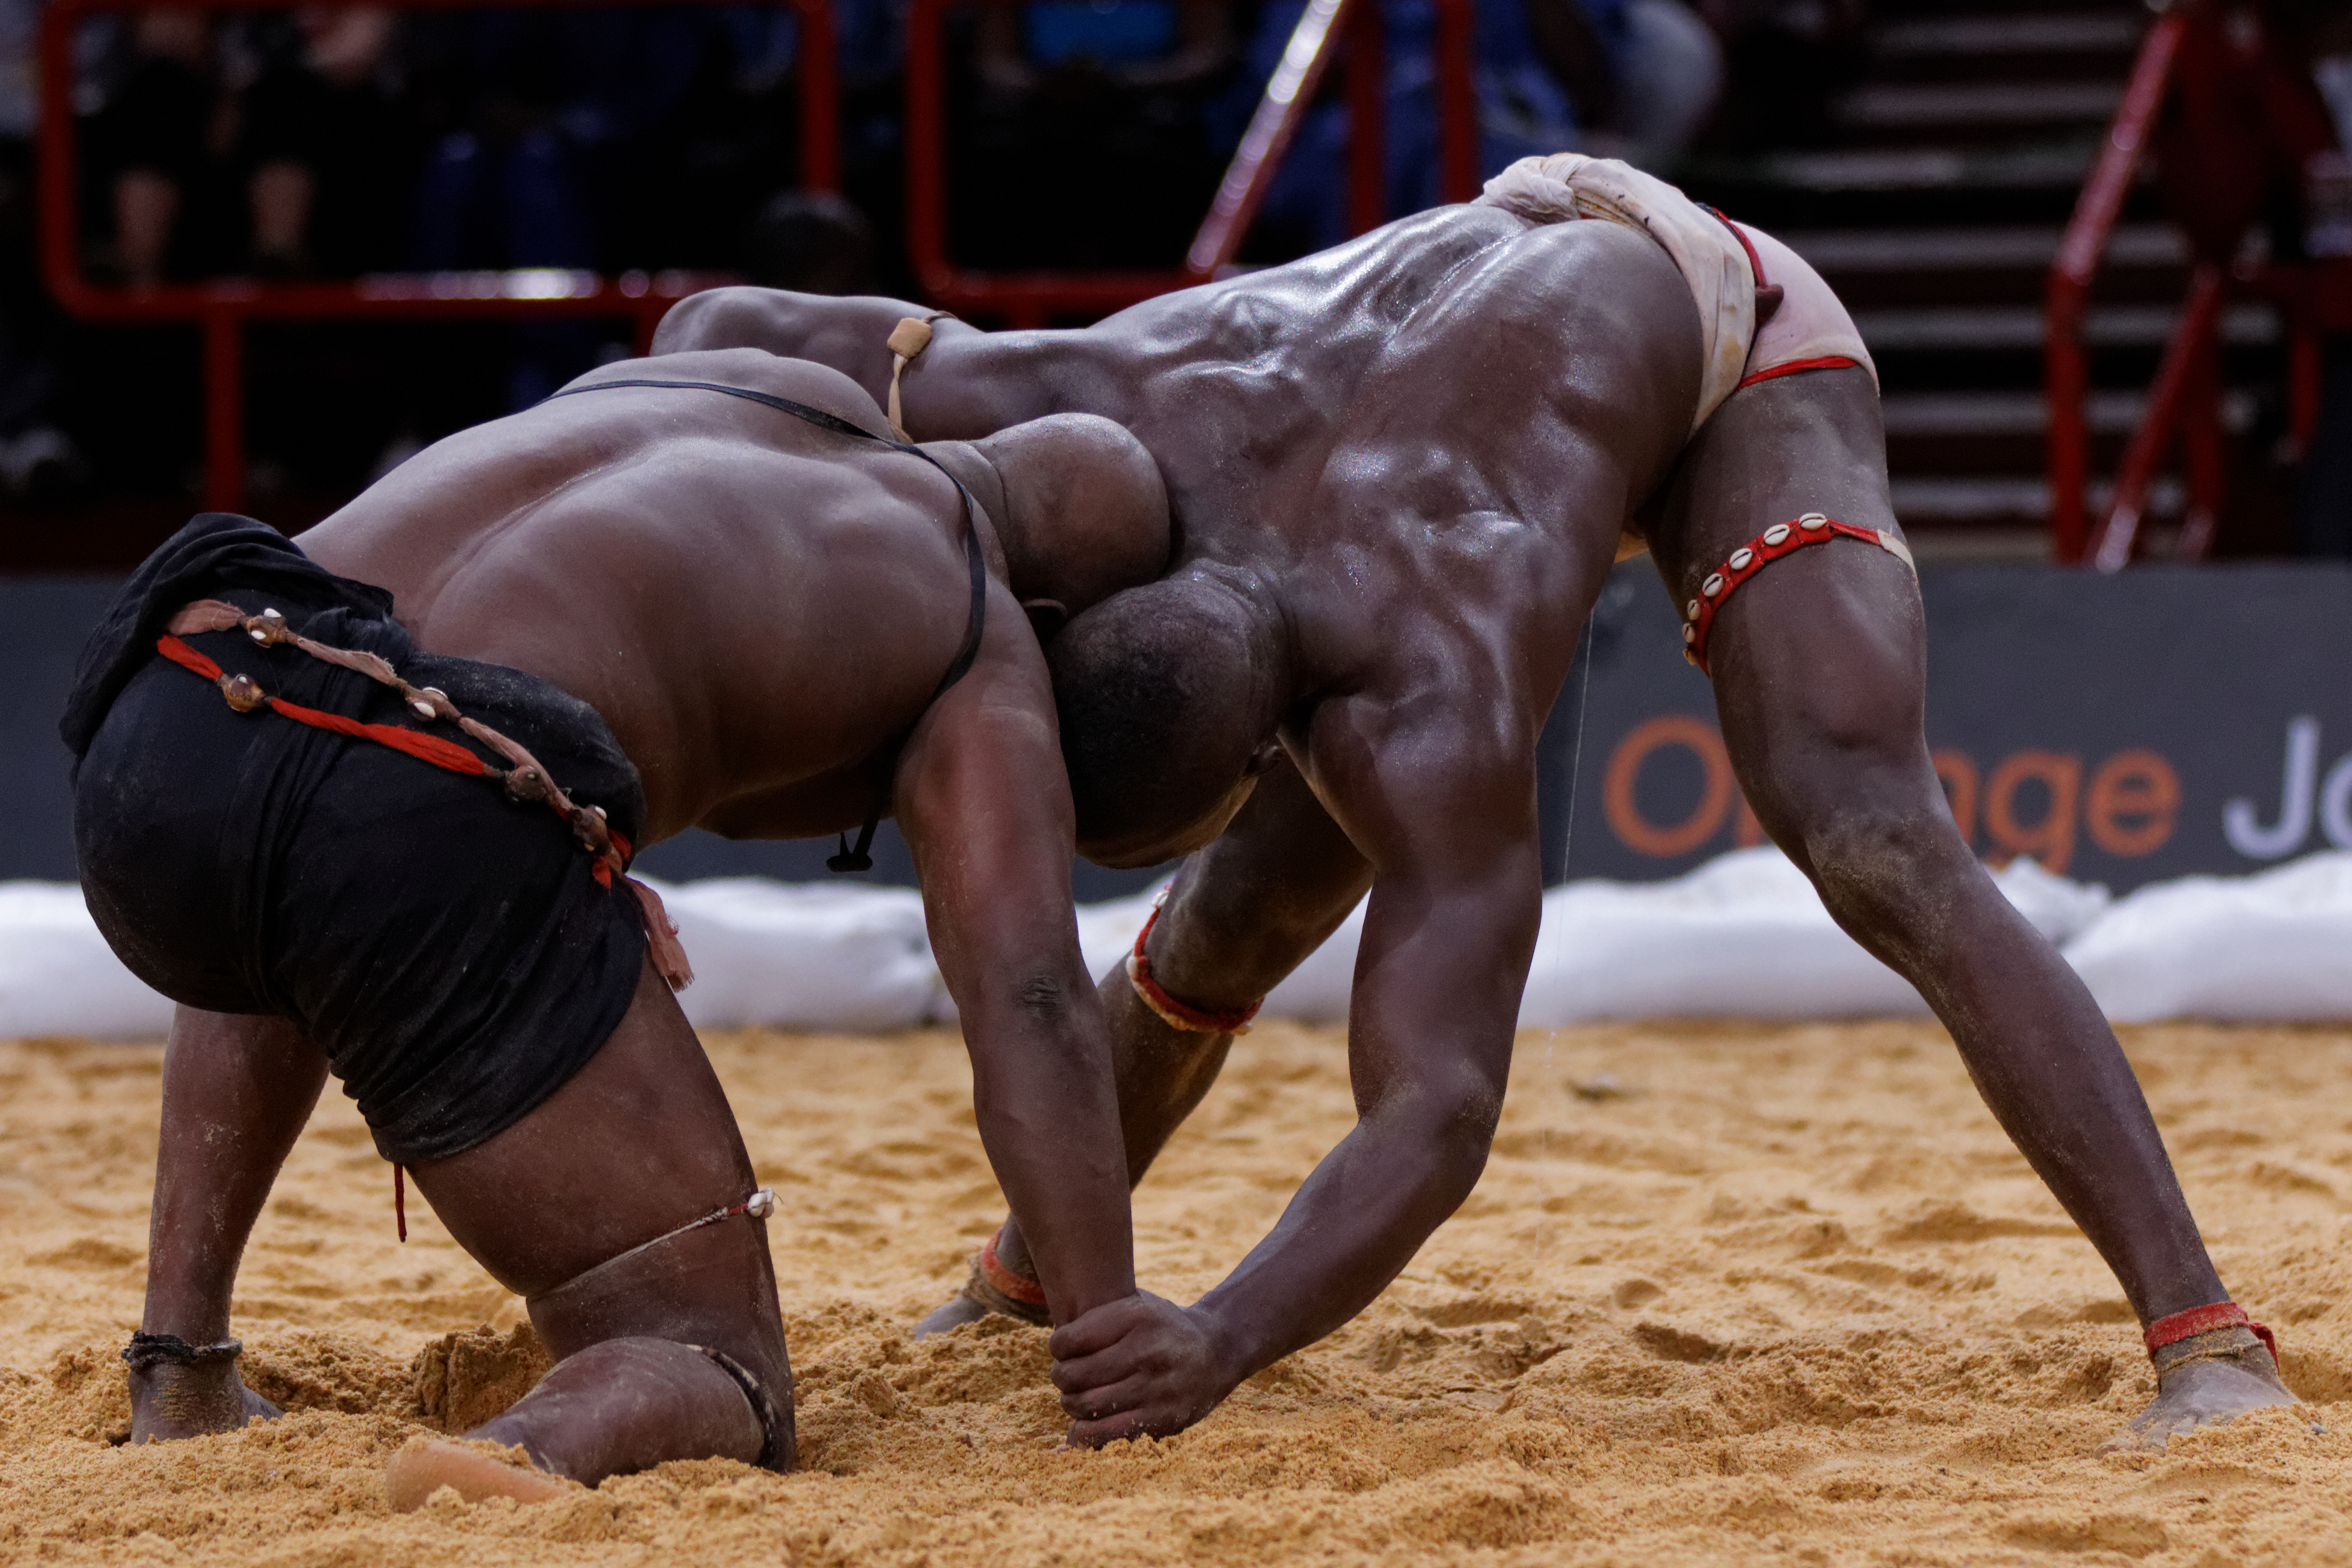 Indoor Senegalese wrestling during the World African Wrestling World Tour, Mame Balla versue Pape Mor Lô at Palais Omnisports de Paris-Bercy. Photo taken on June 8, 2013.